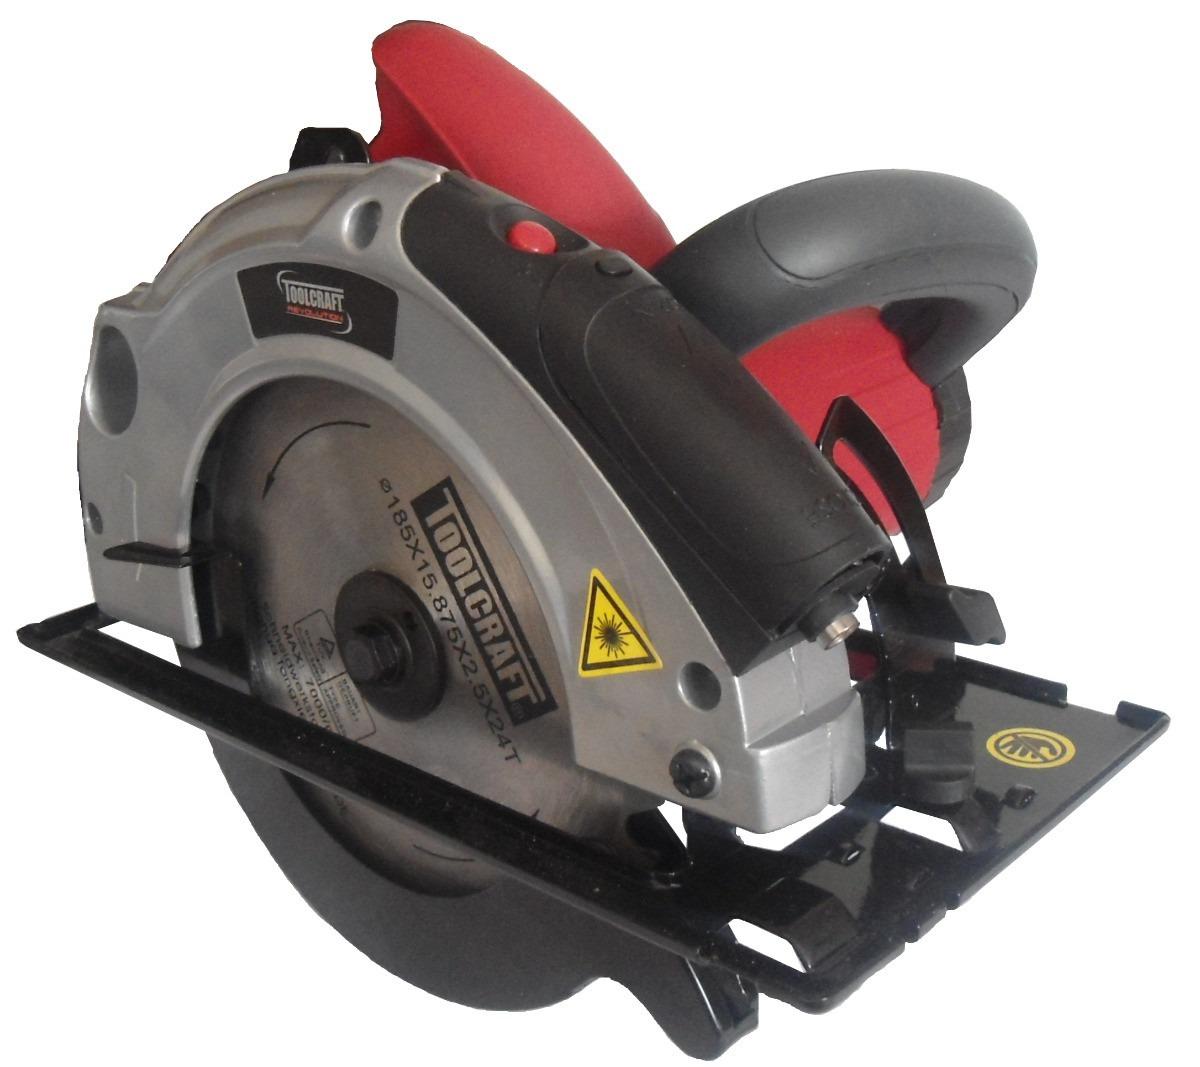 Sierra circular de 7 1 4 toolcraft tc1957 guia laser - Sierra circular precio ...